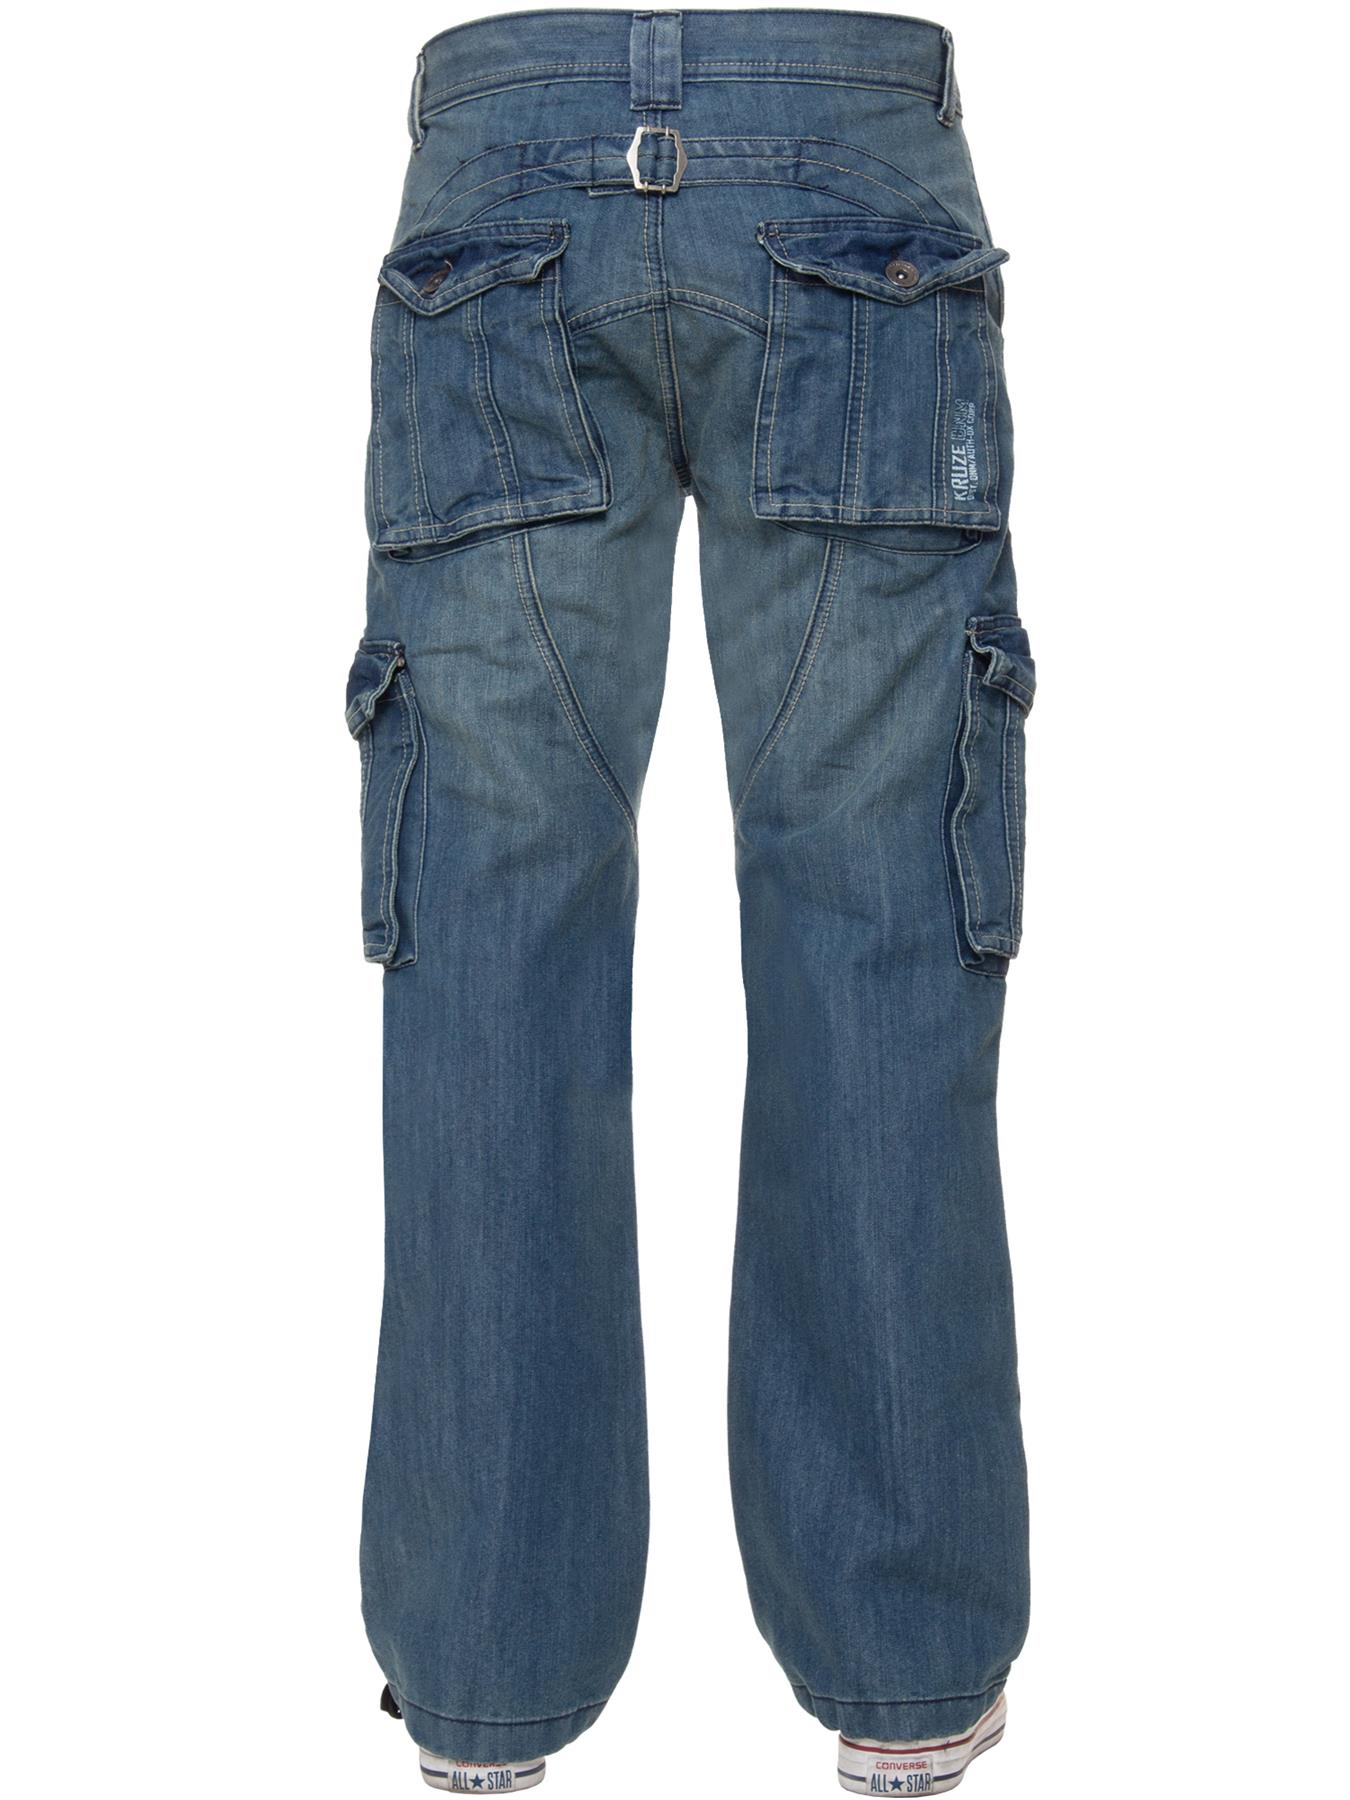 Kruze-Mens-Desginer-Cargo-Combat-Jeans-Trousers-Denim-Pants-Big-Tall-All-Waists thumbnail 6